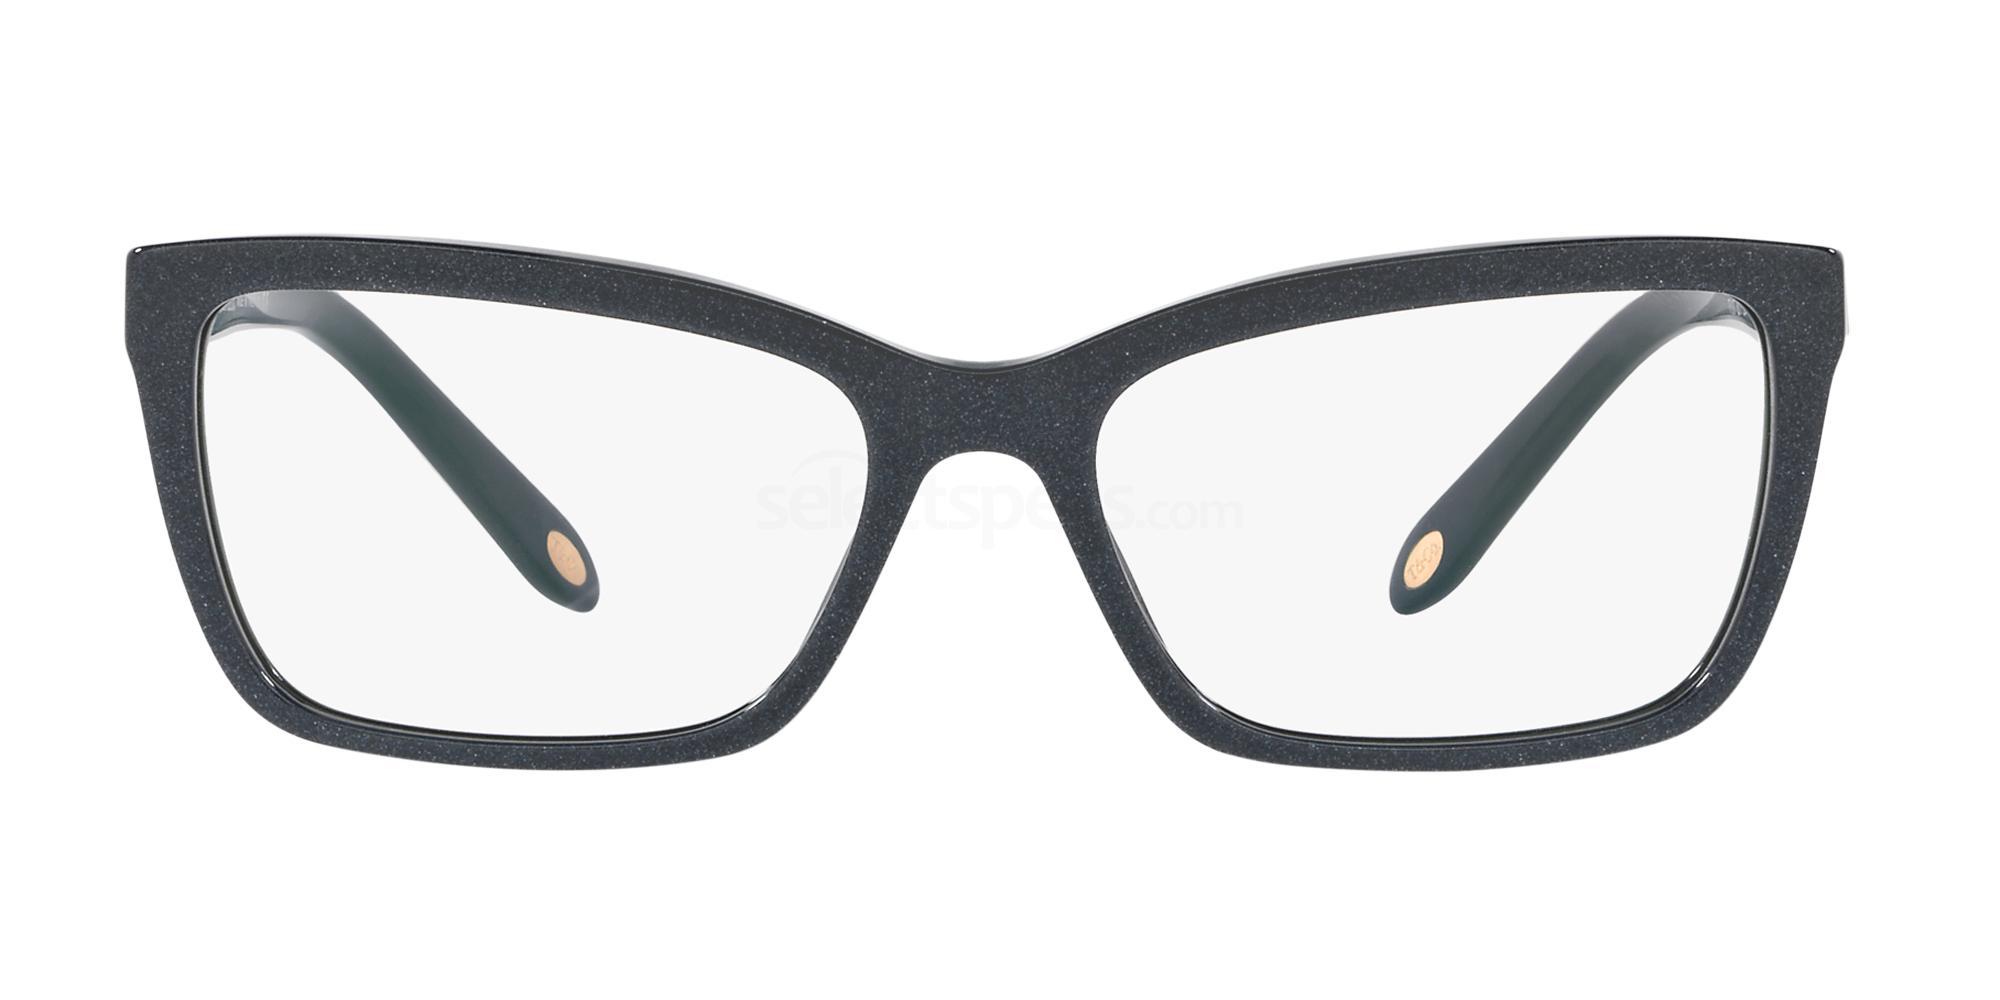 8211 TF2137 Glasses, Tiffany & Co.